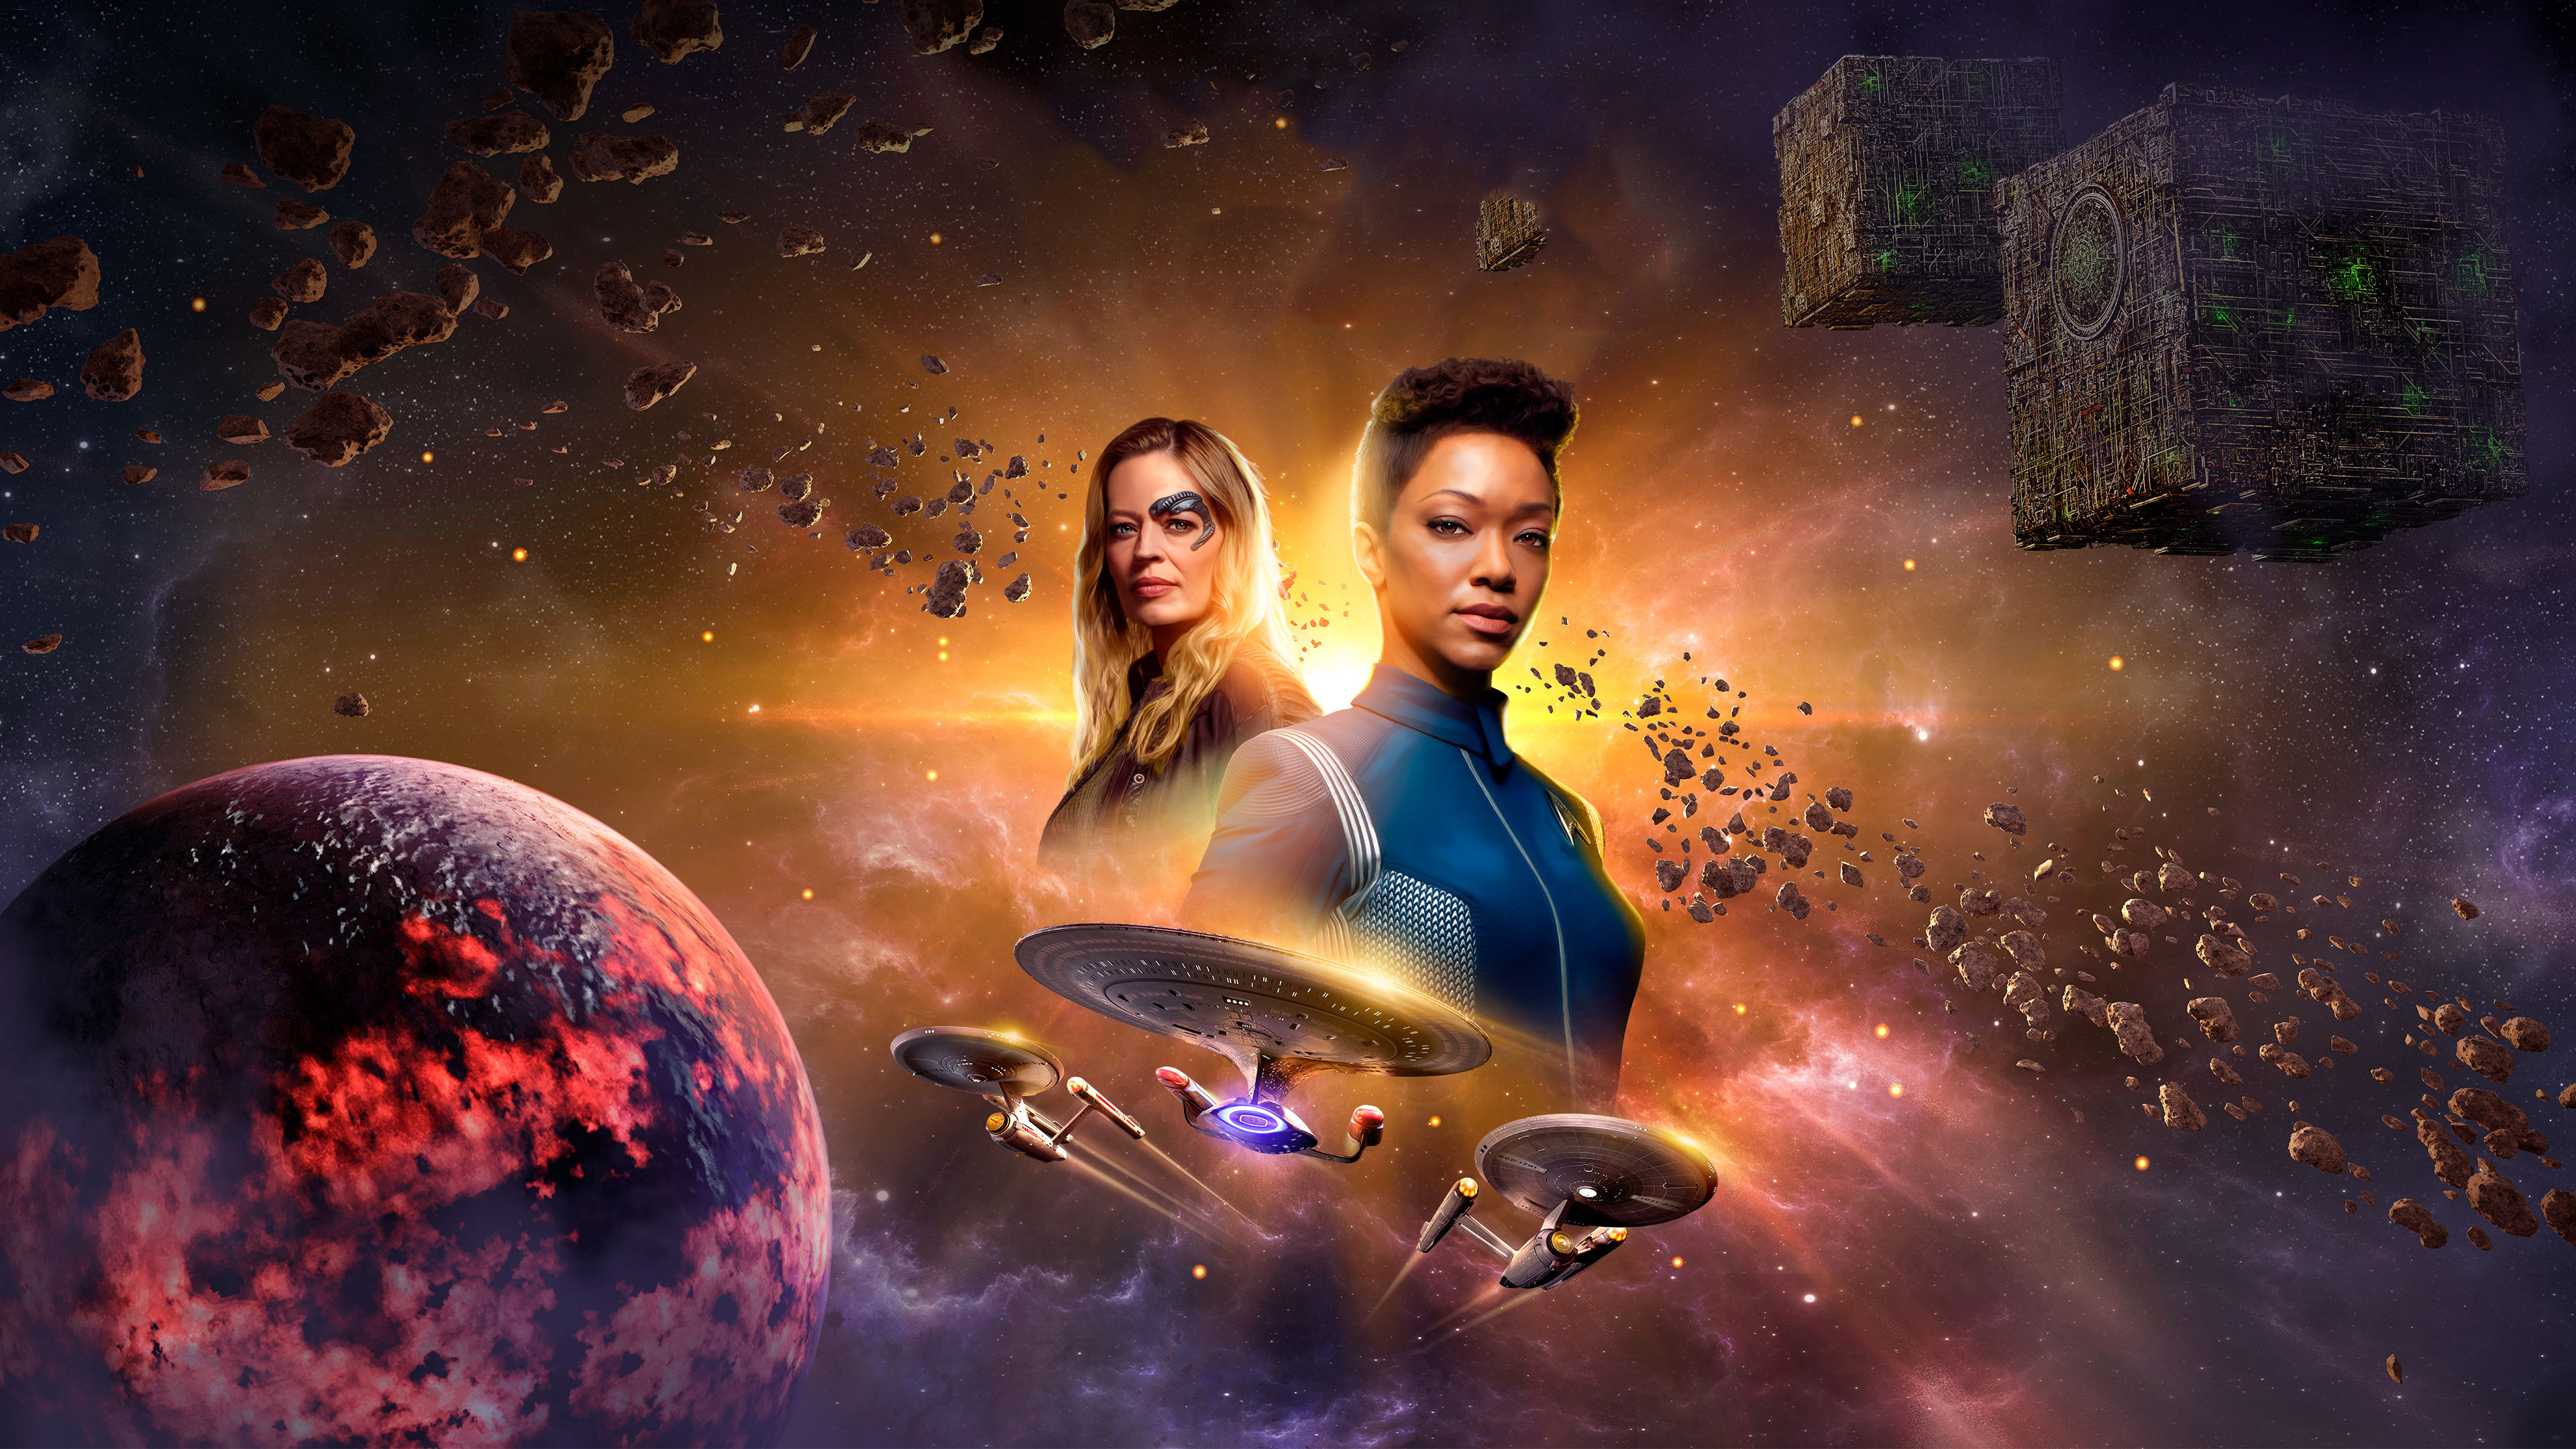 Star Trek Online 2020 Game Wallpaper, HD Games 4K ...